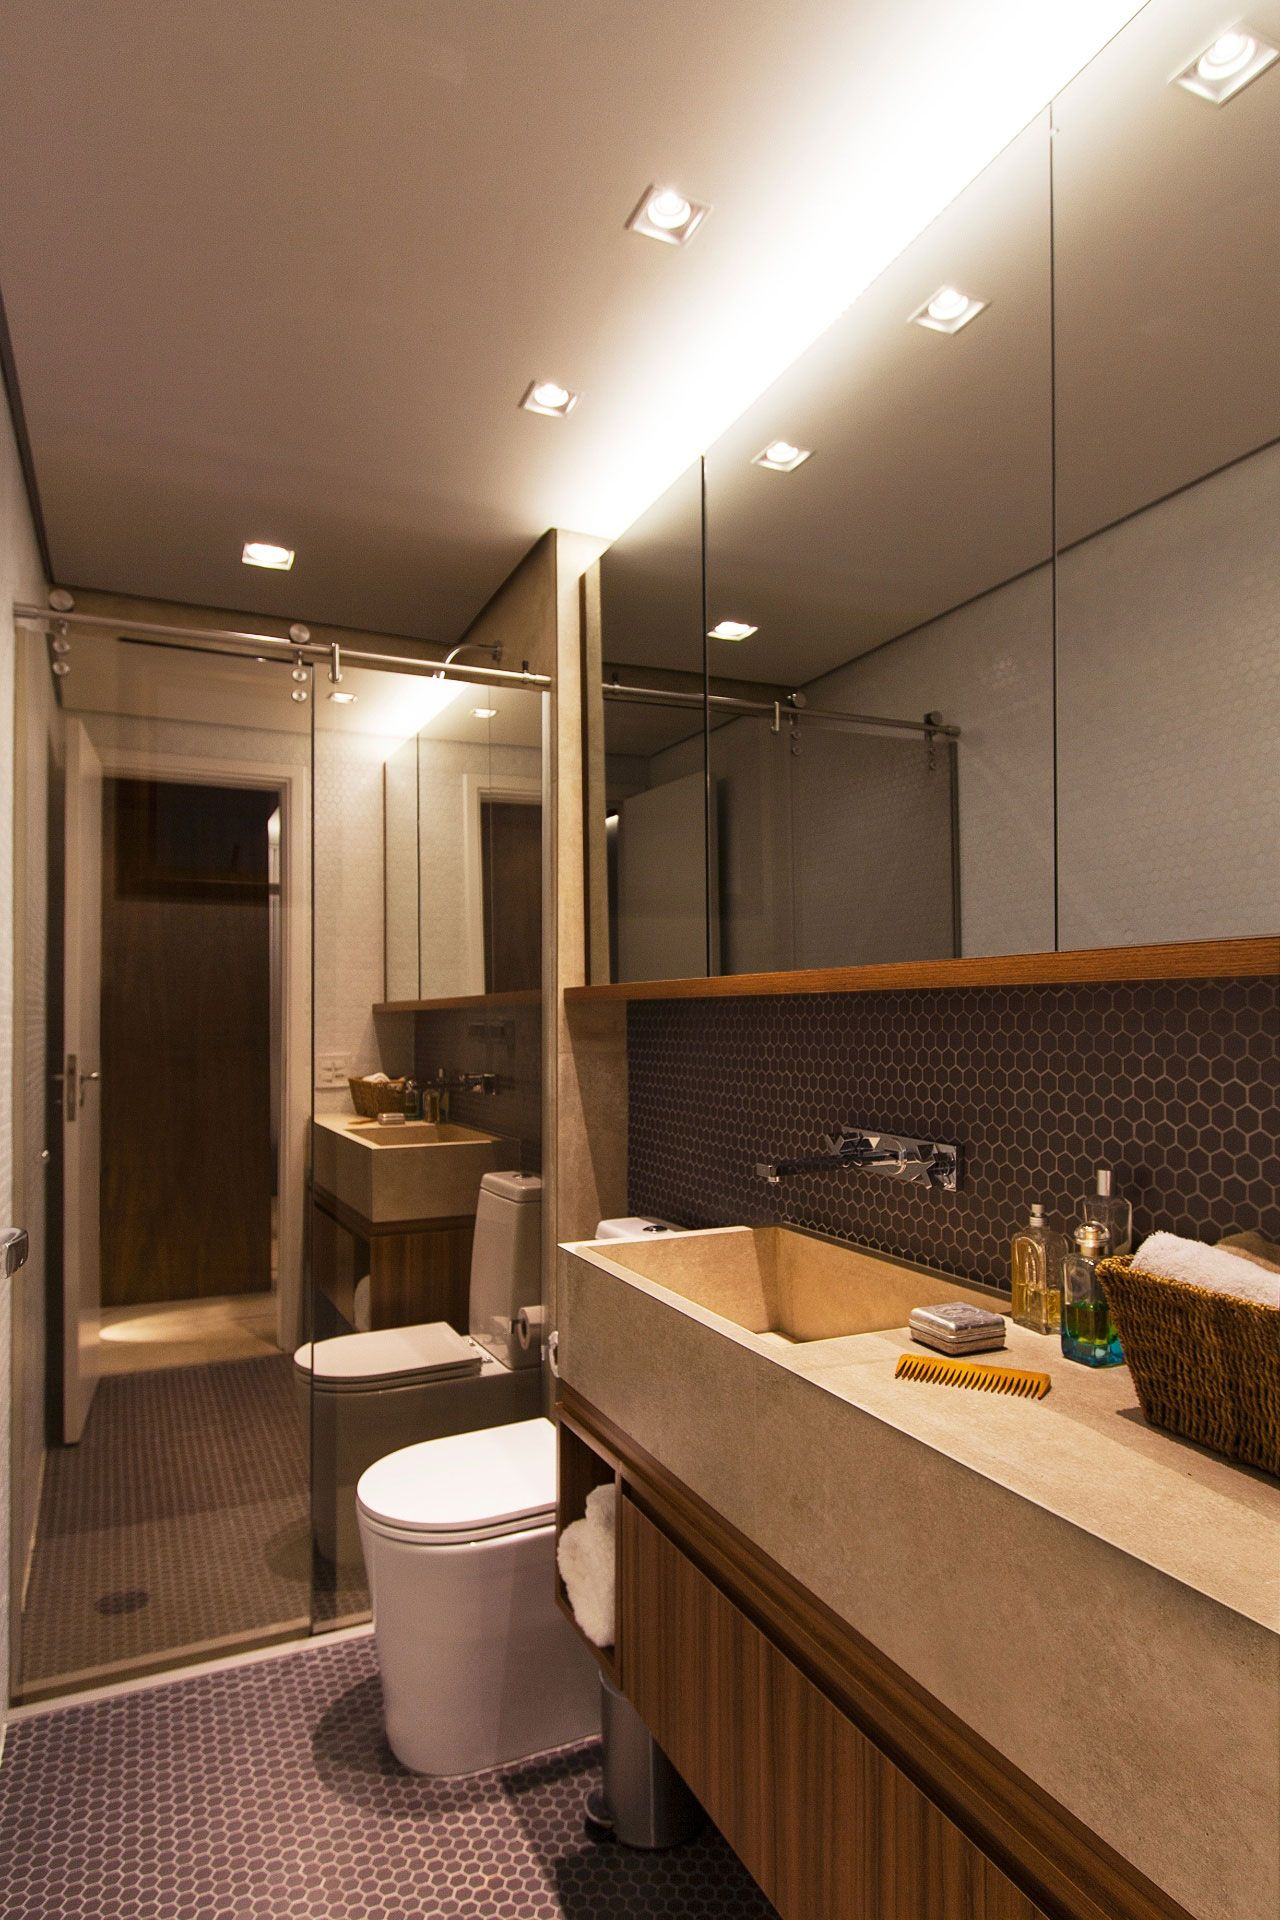 Banheiro decorado clean e moderno